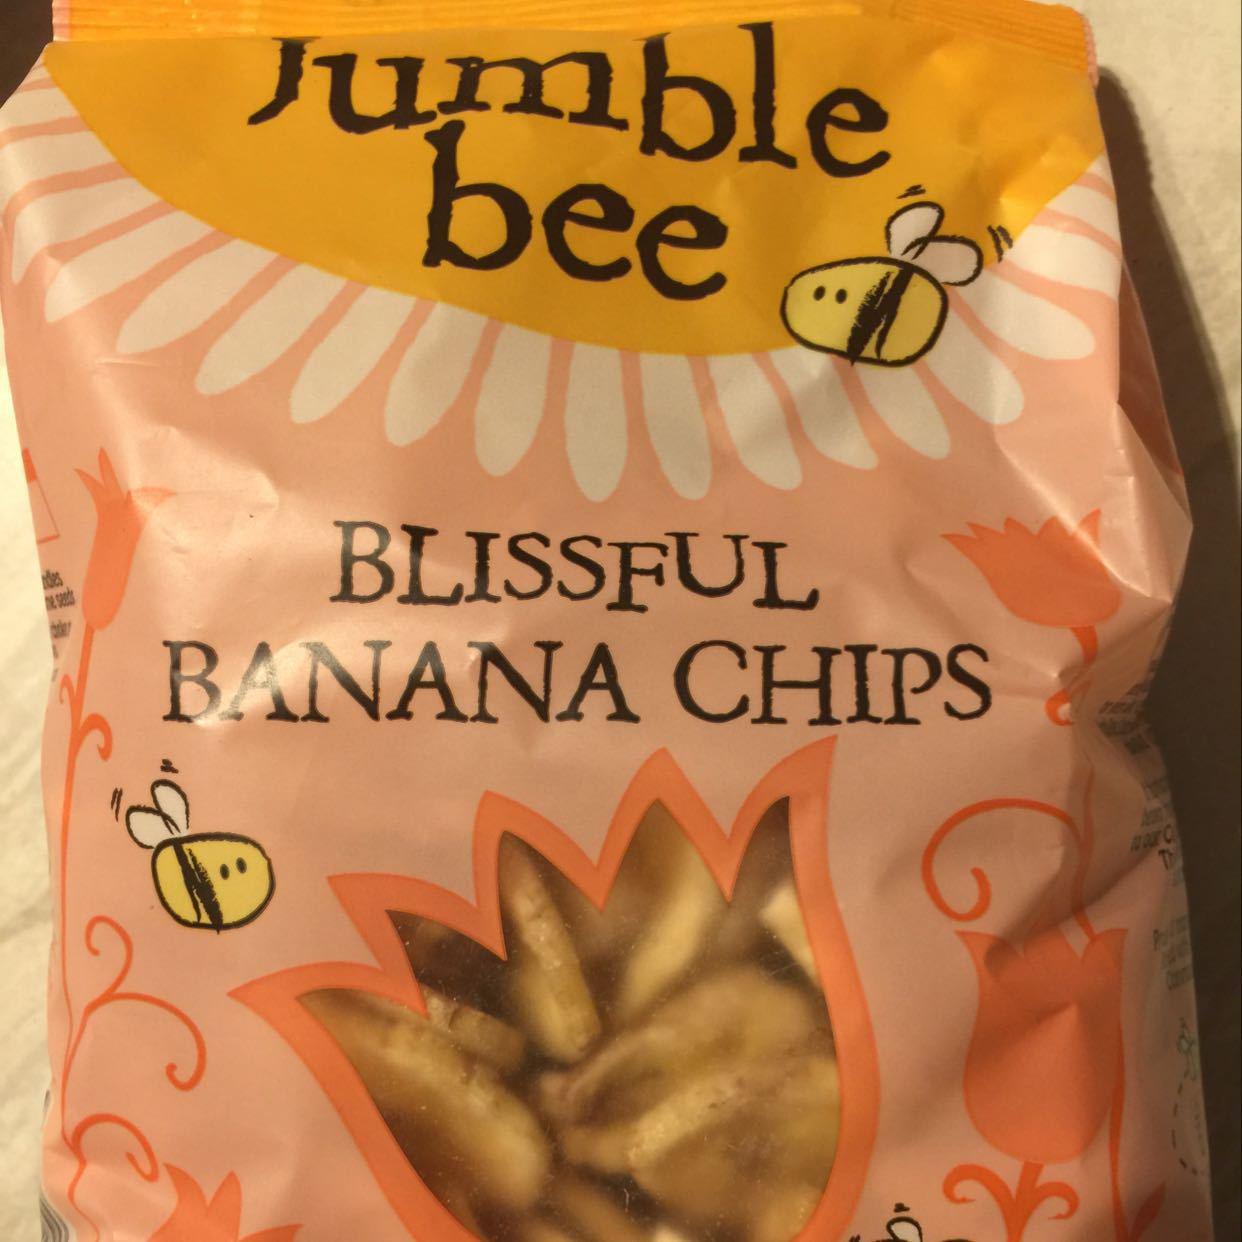 Jumble Bee banana chips